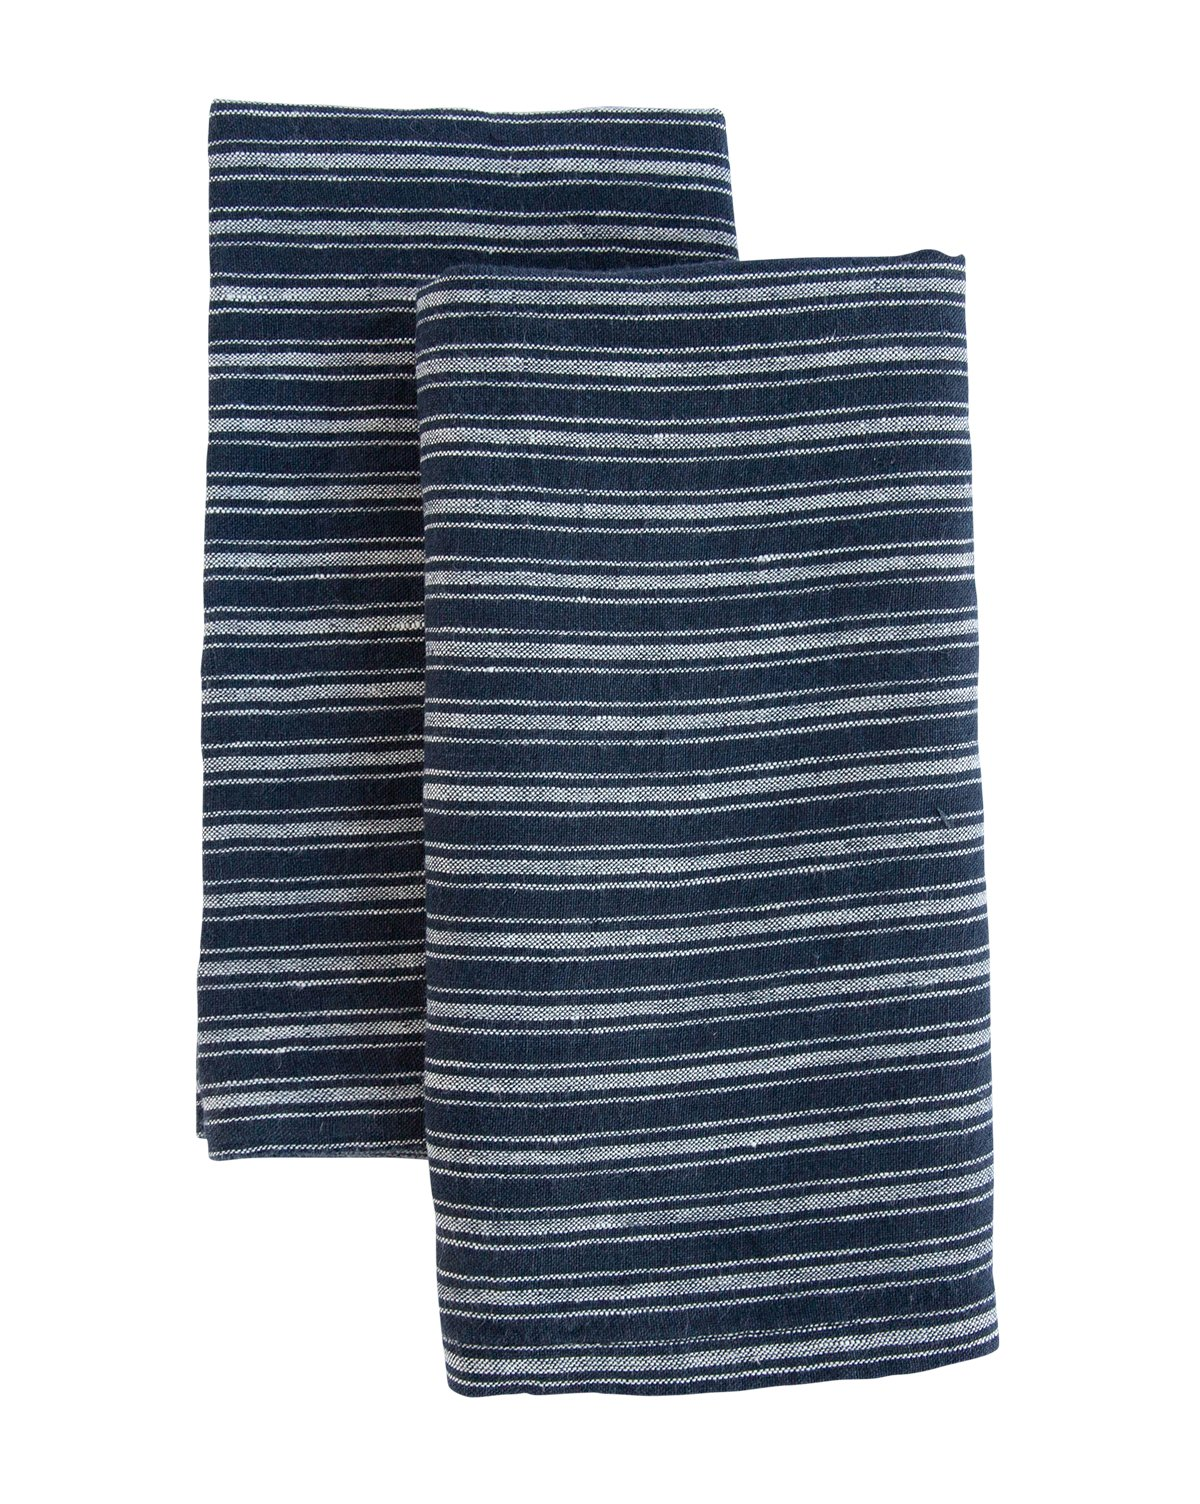 Windsor_Hand_Towels_1.jpg